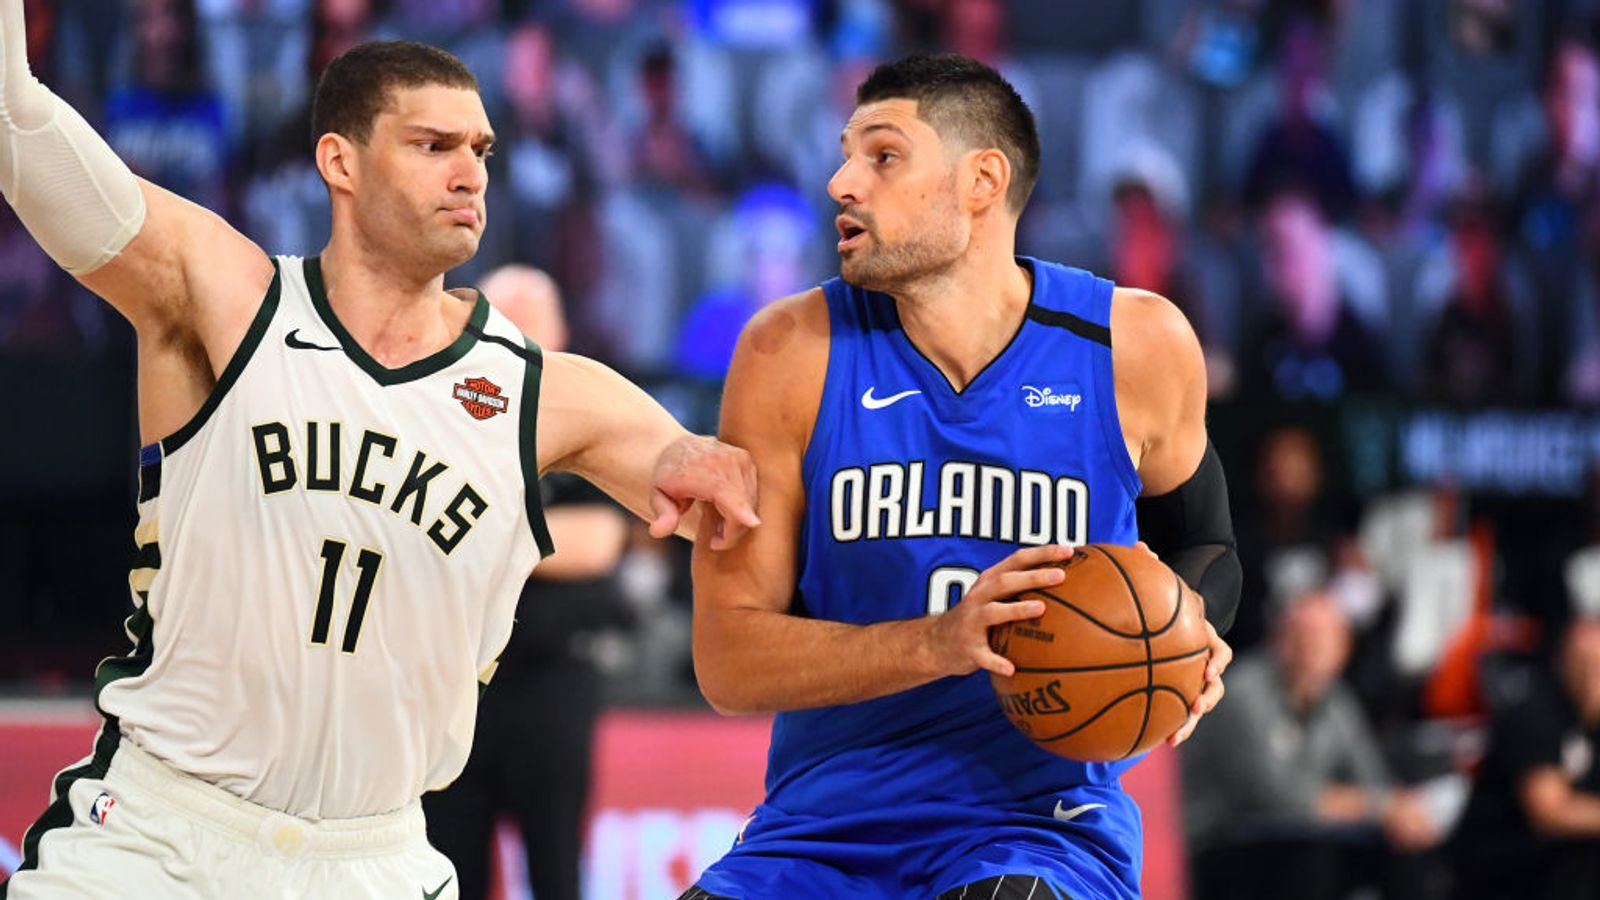 Orlando Magic land surprising victory over top-seeded Milwaukee Bucks